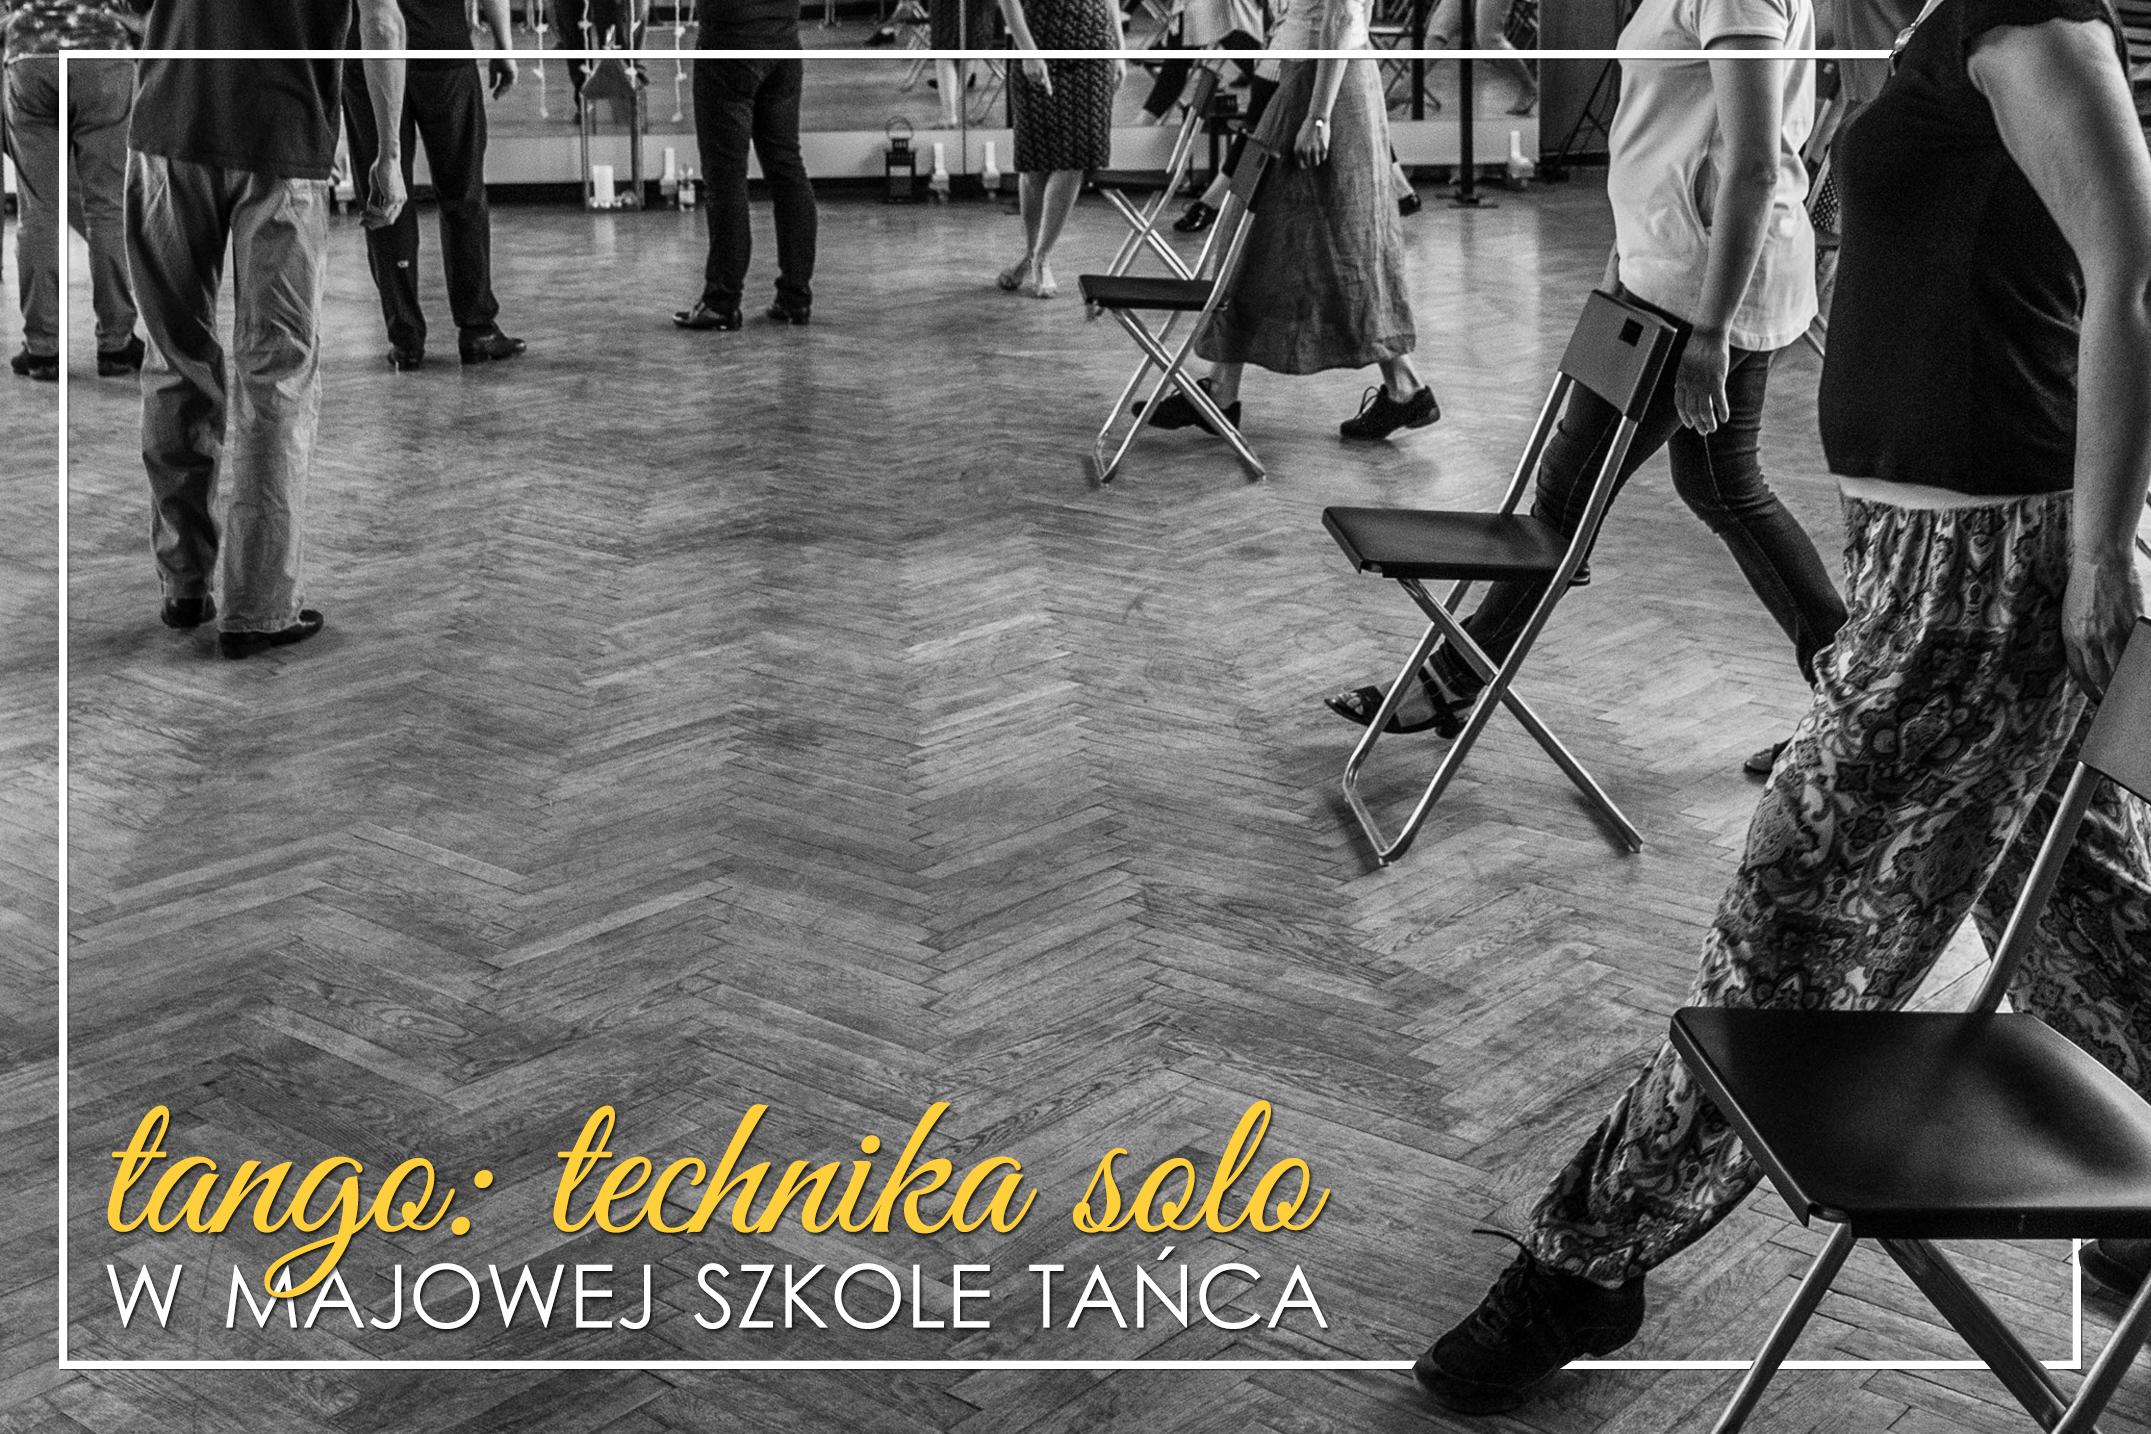 Tango technika solo